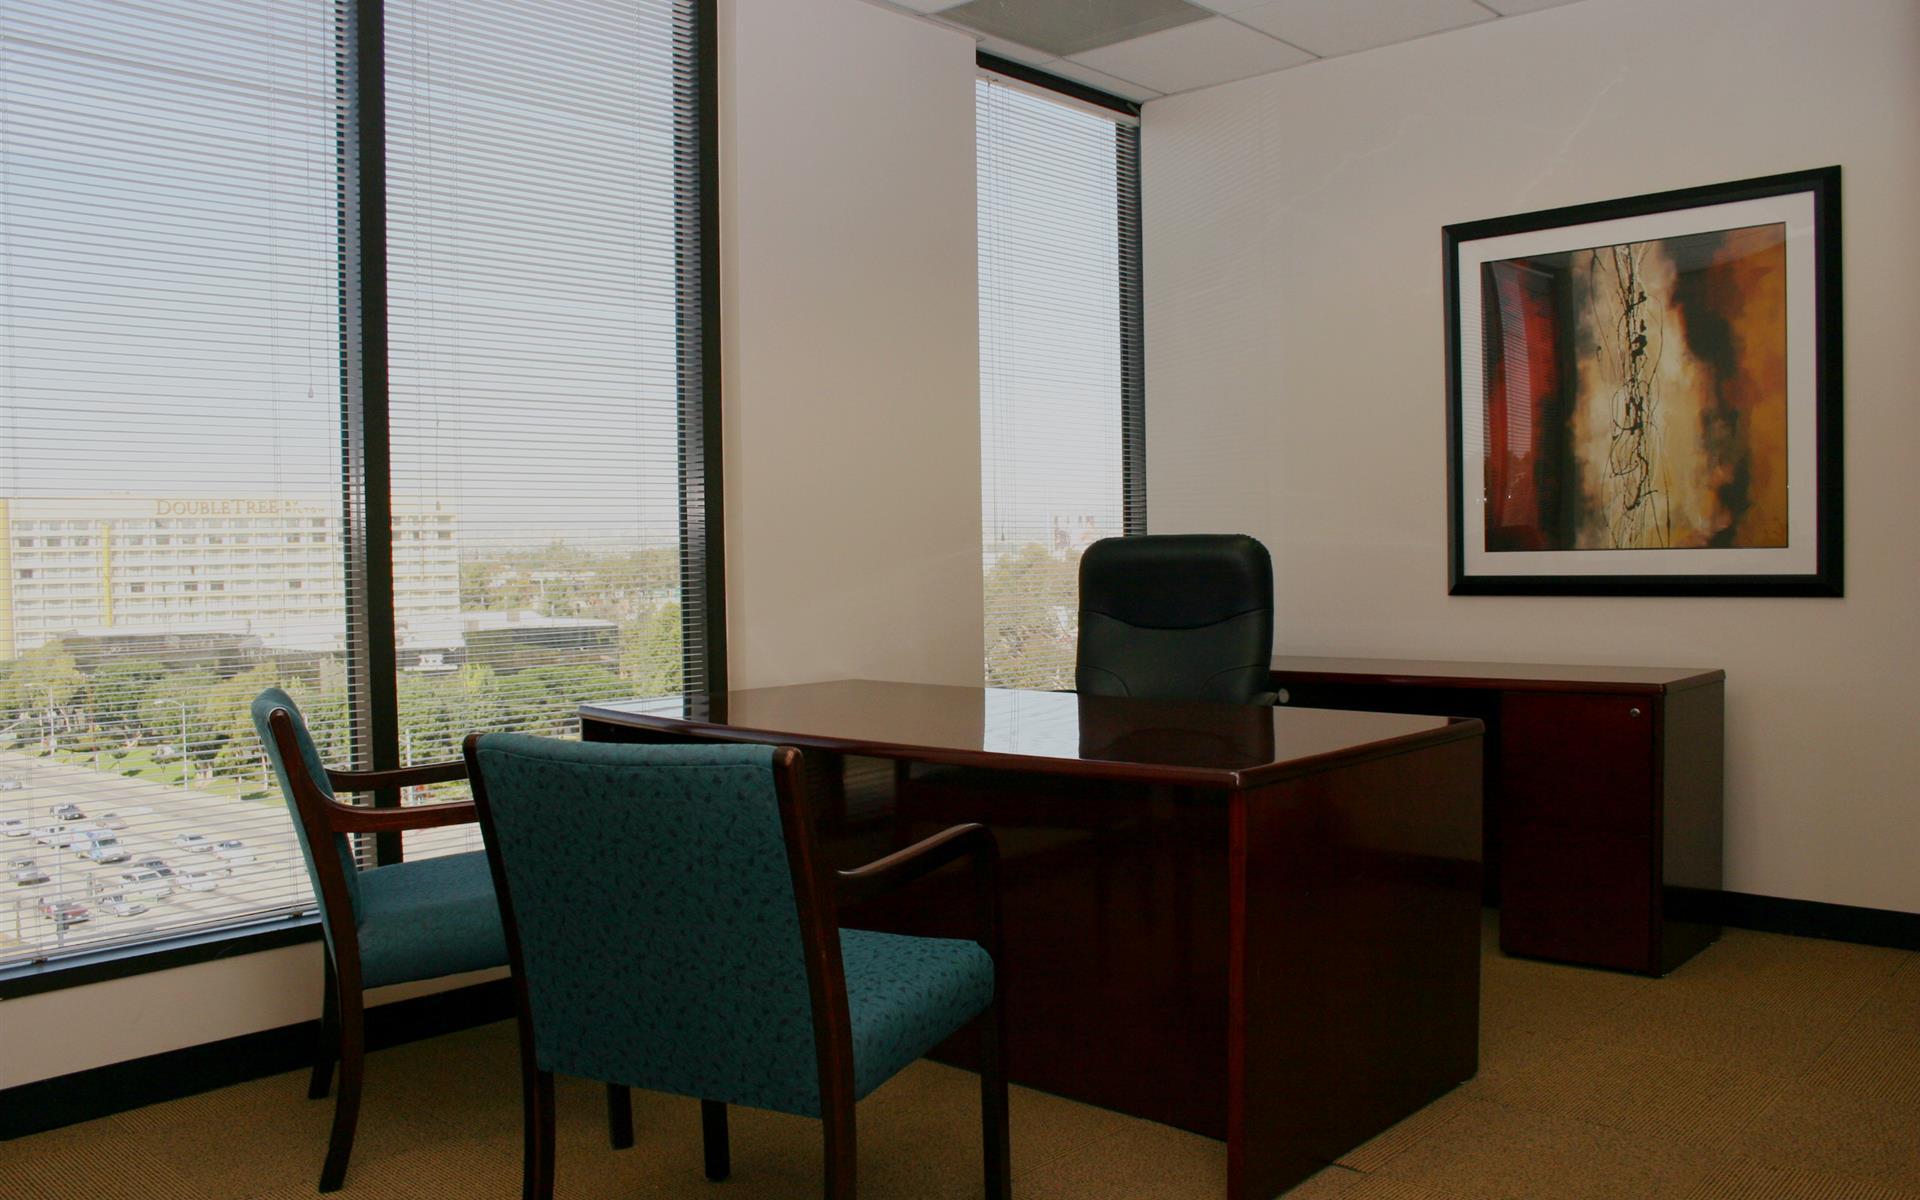 (HHC) Howard Hughes Center - Exterior Office